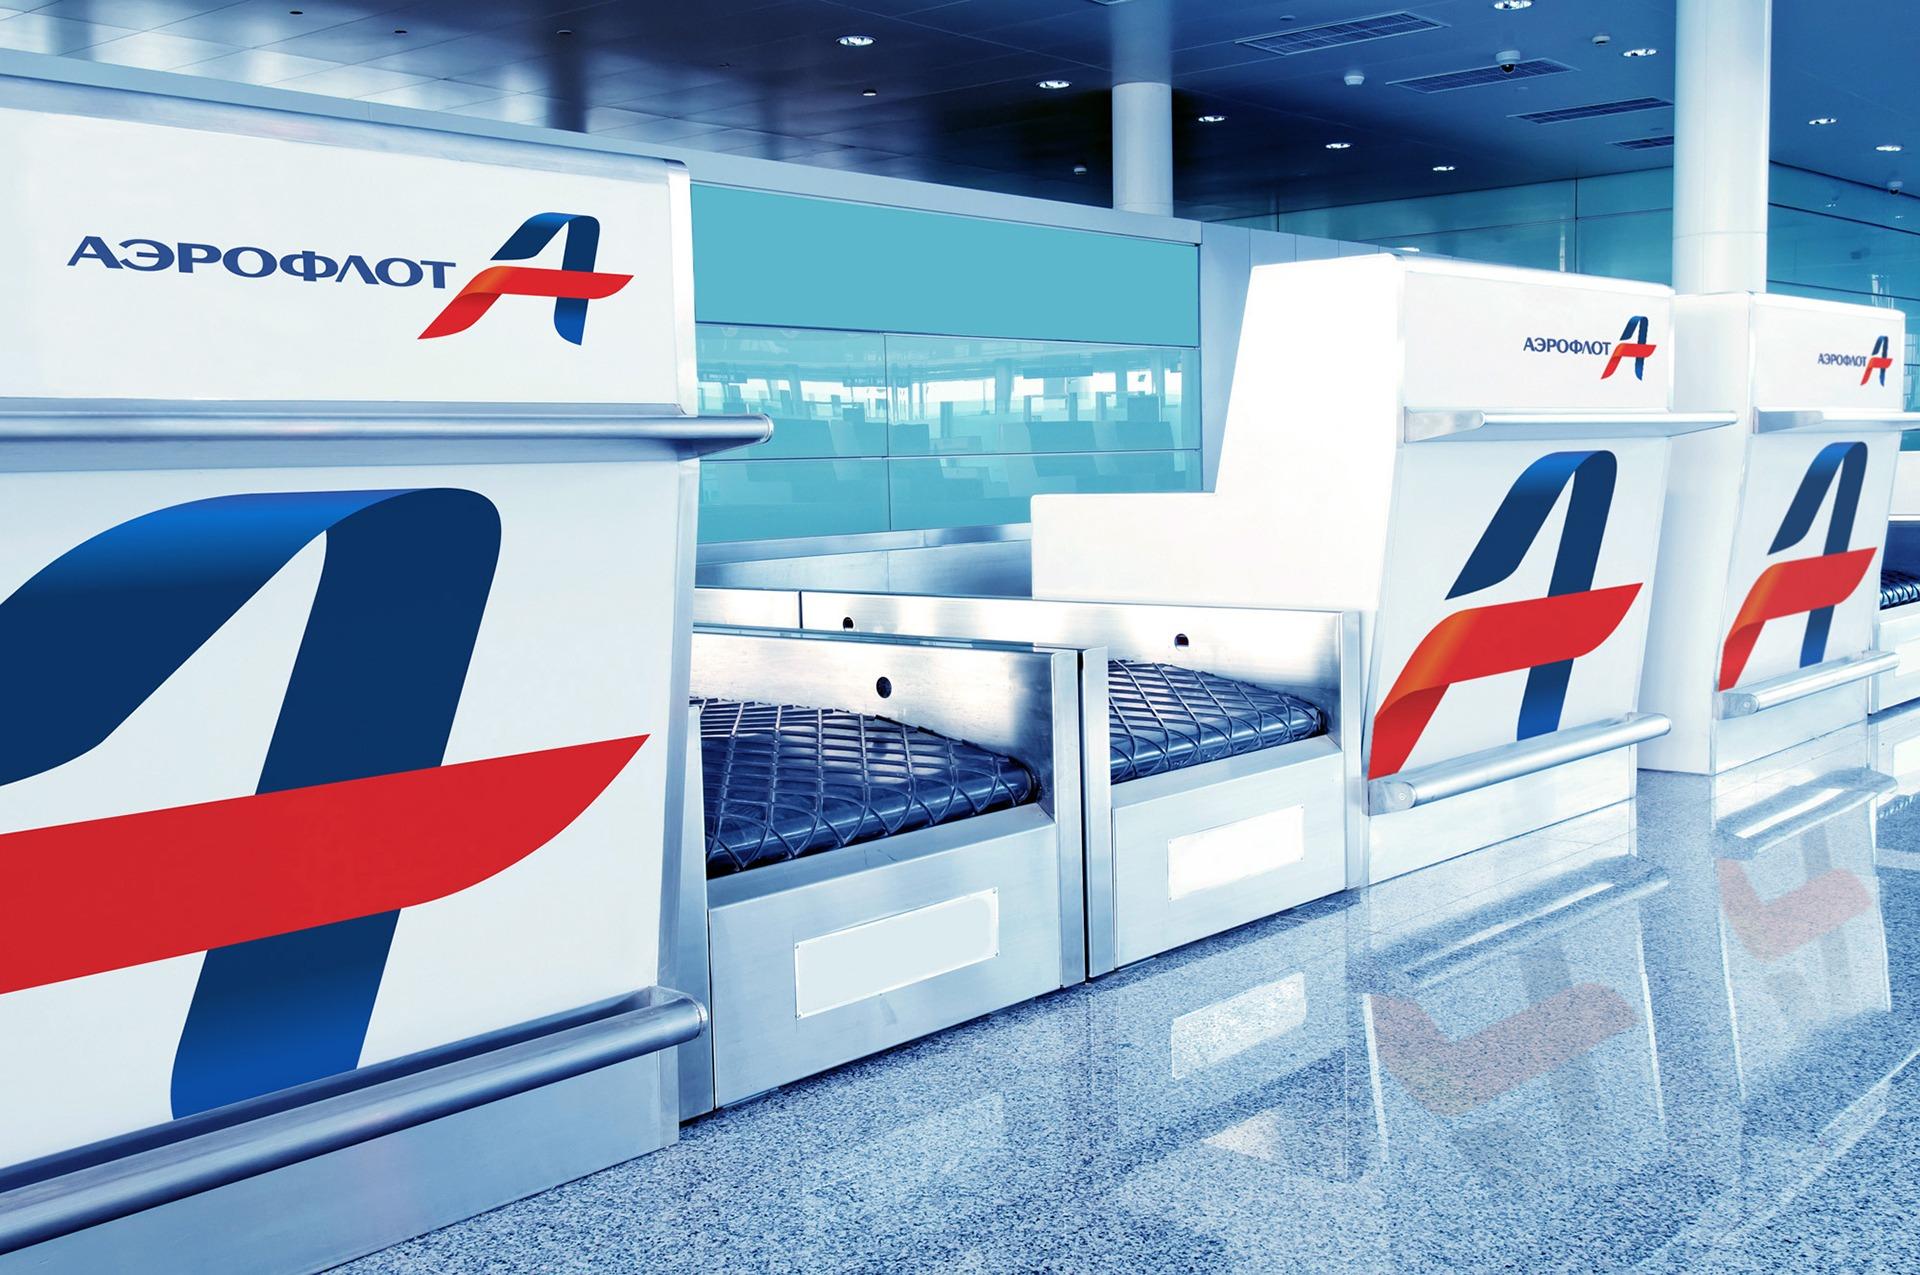 Aeroflot identity, re-branding, ребрендинг авиакомпании, фирменный стиль авиакомпании, Asgard Branding, лого Аэрофлот, airlines logo